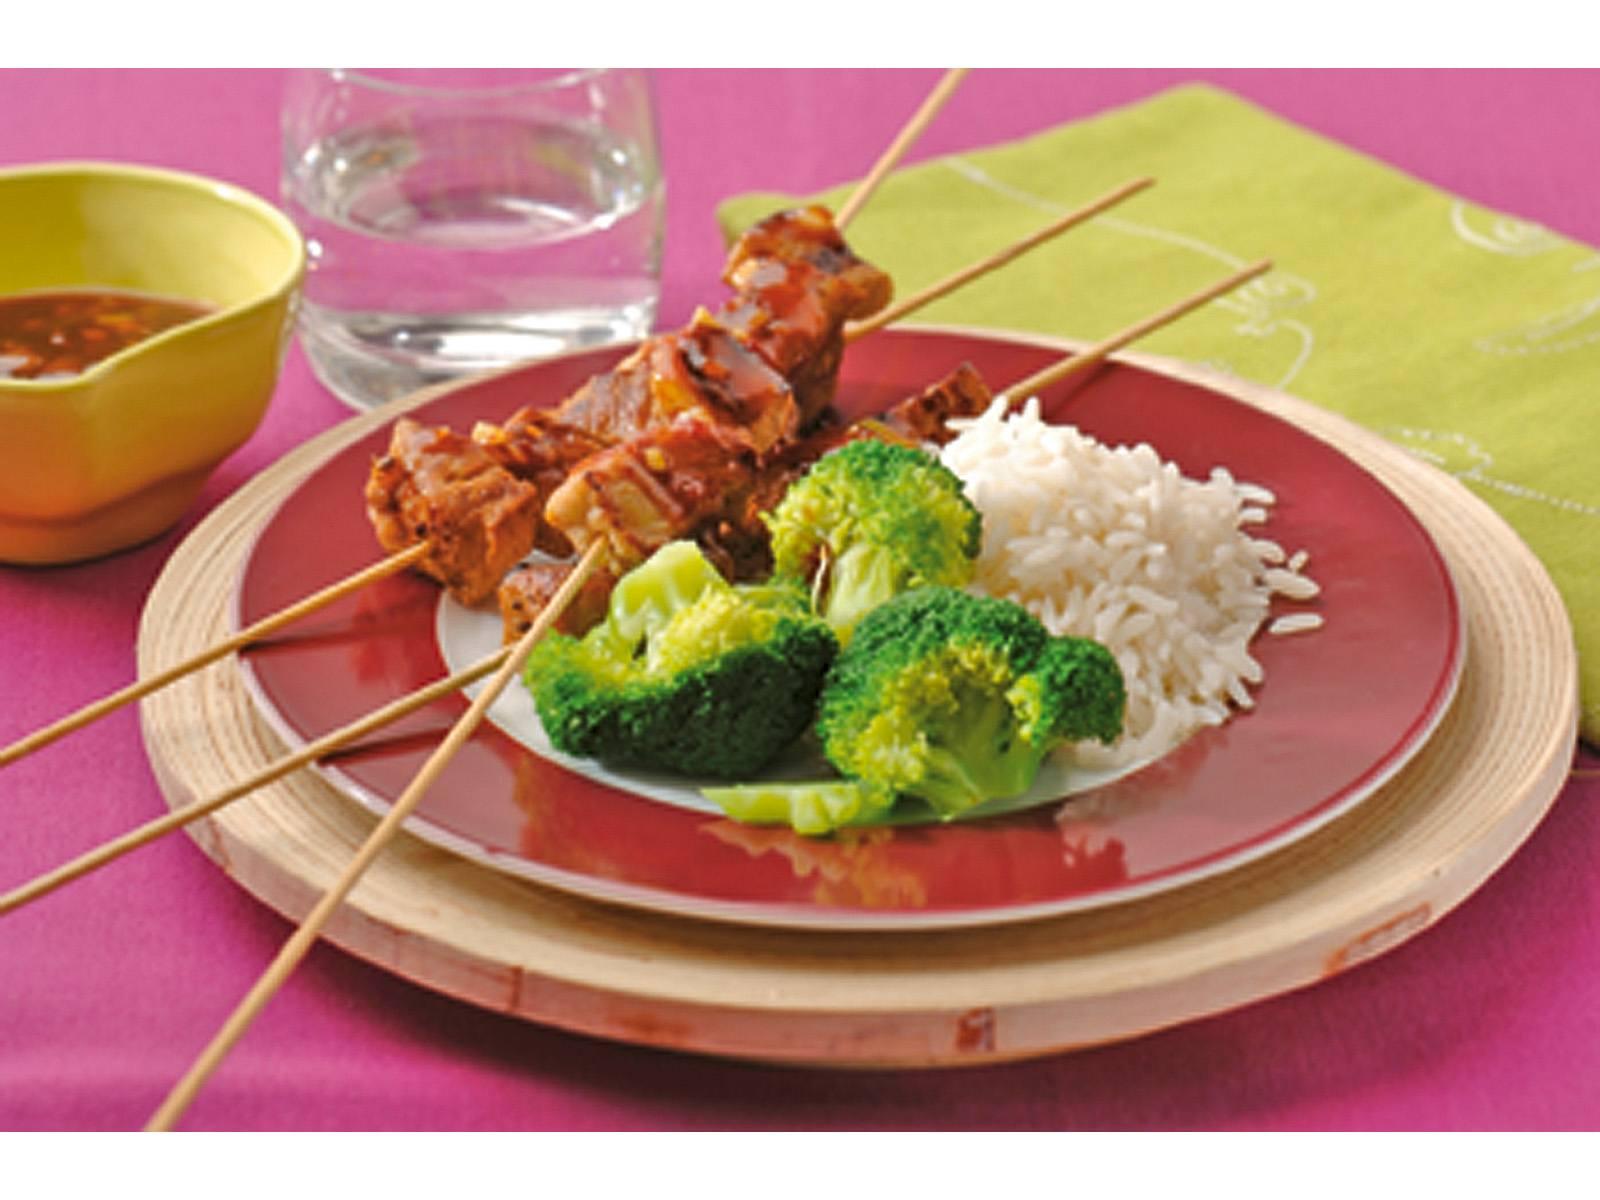 Sate met sambal ketjapsaus en broccoli